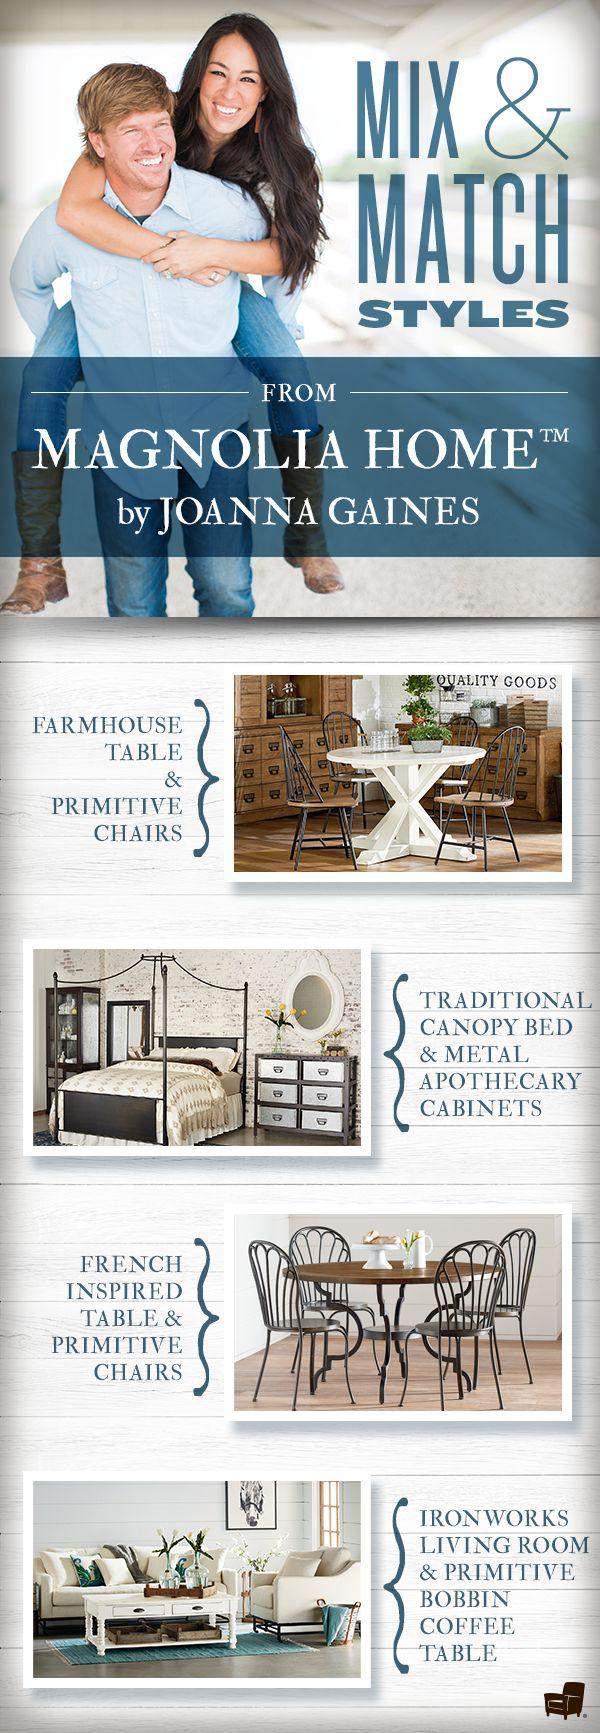 2282 best chip and joanna gaines fixer upper images on pinterest magnolia market farmhouse. Black Bedroom Furniture Sets. Home Design Ideas